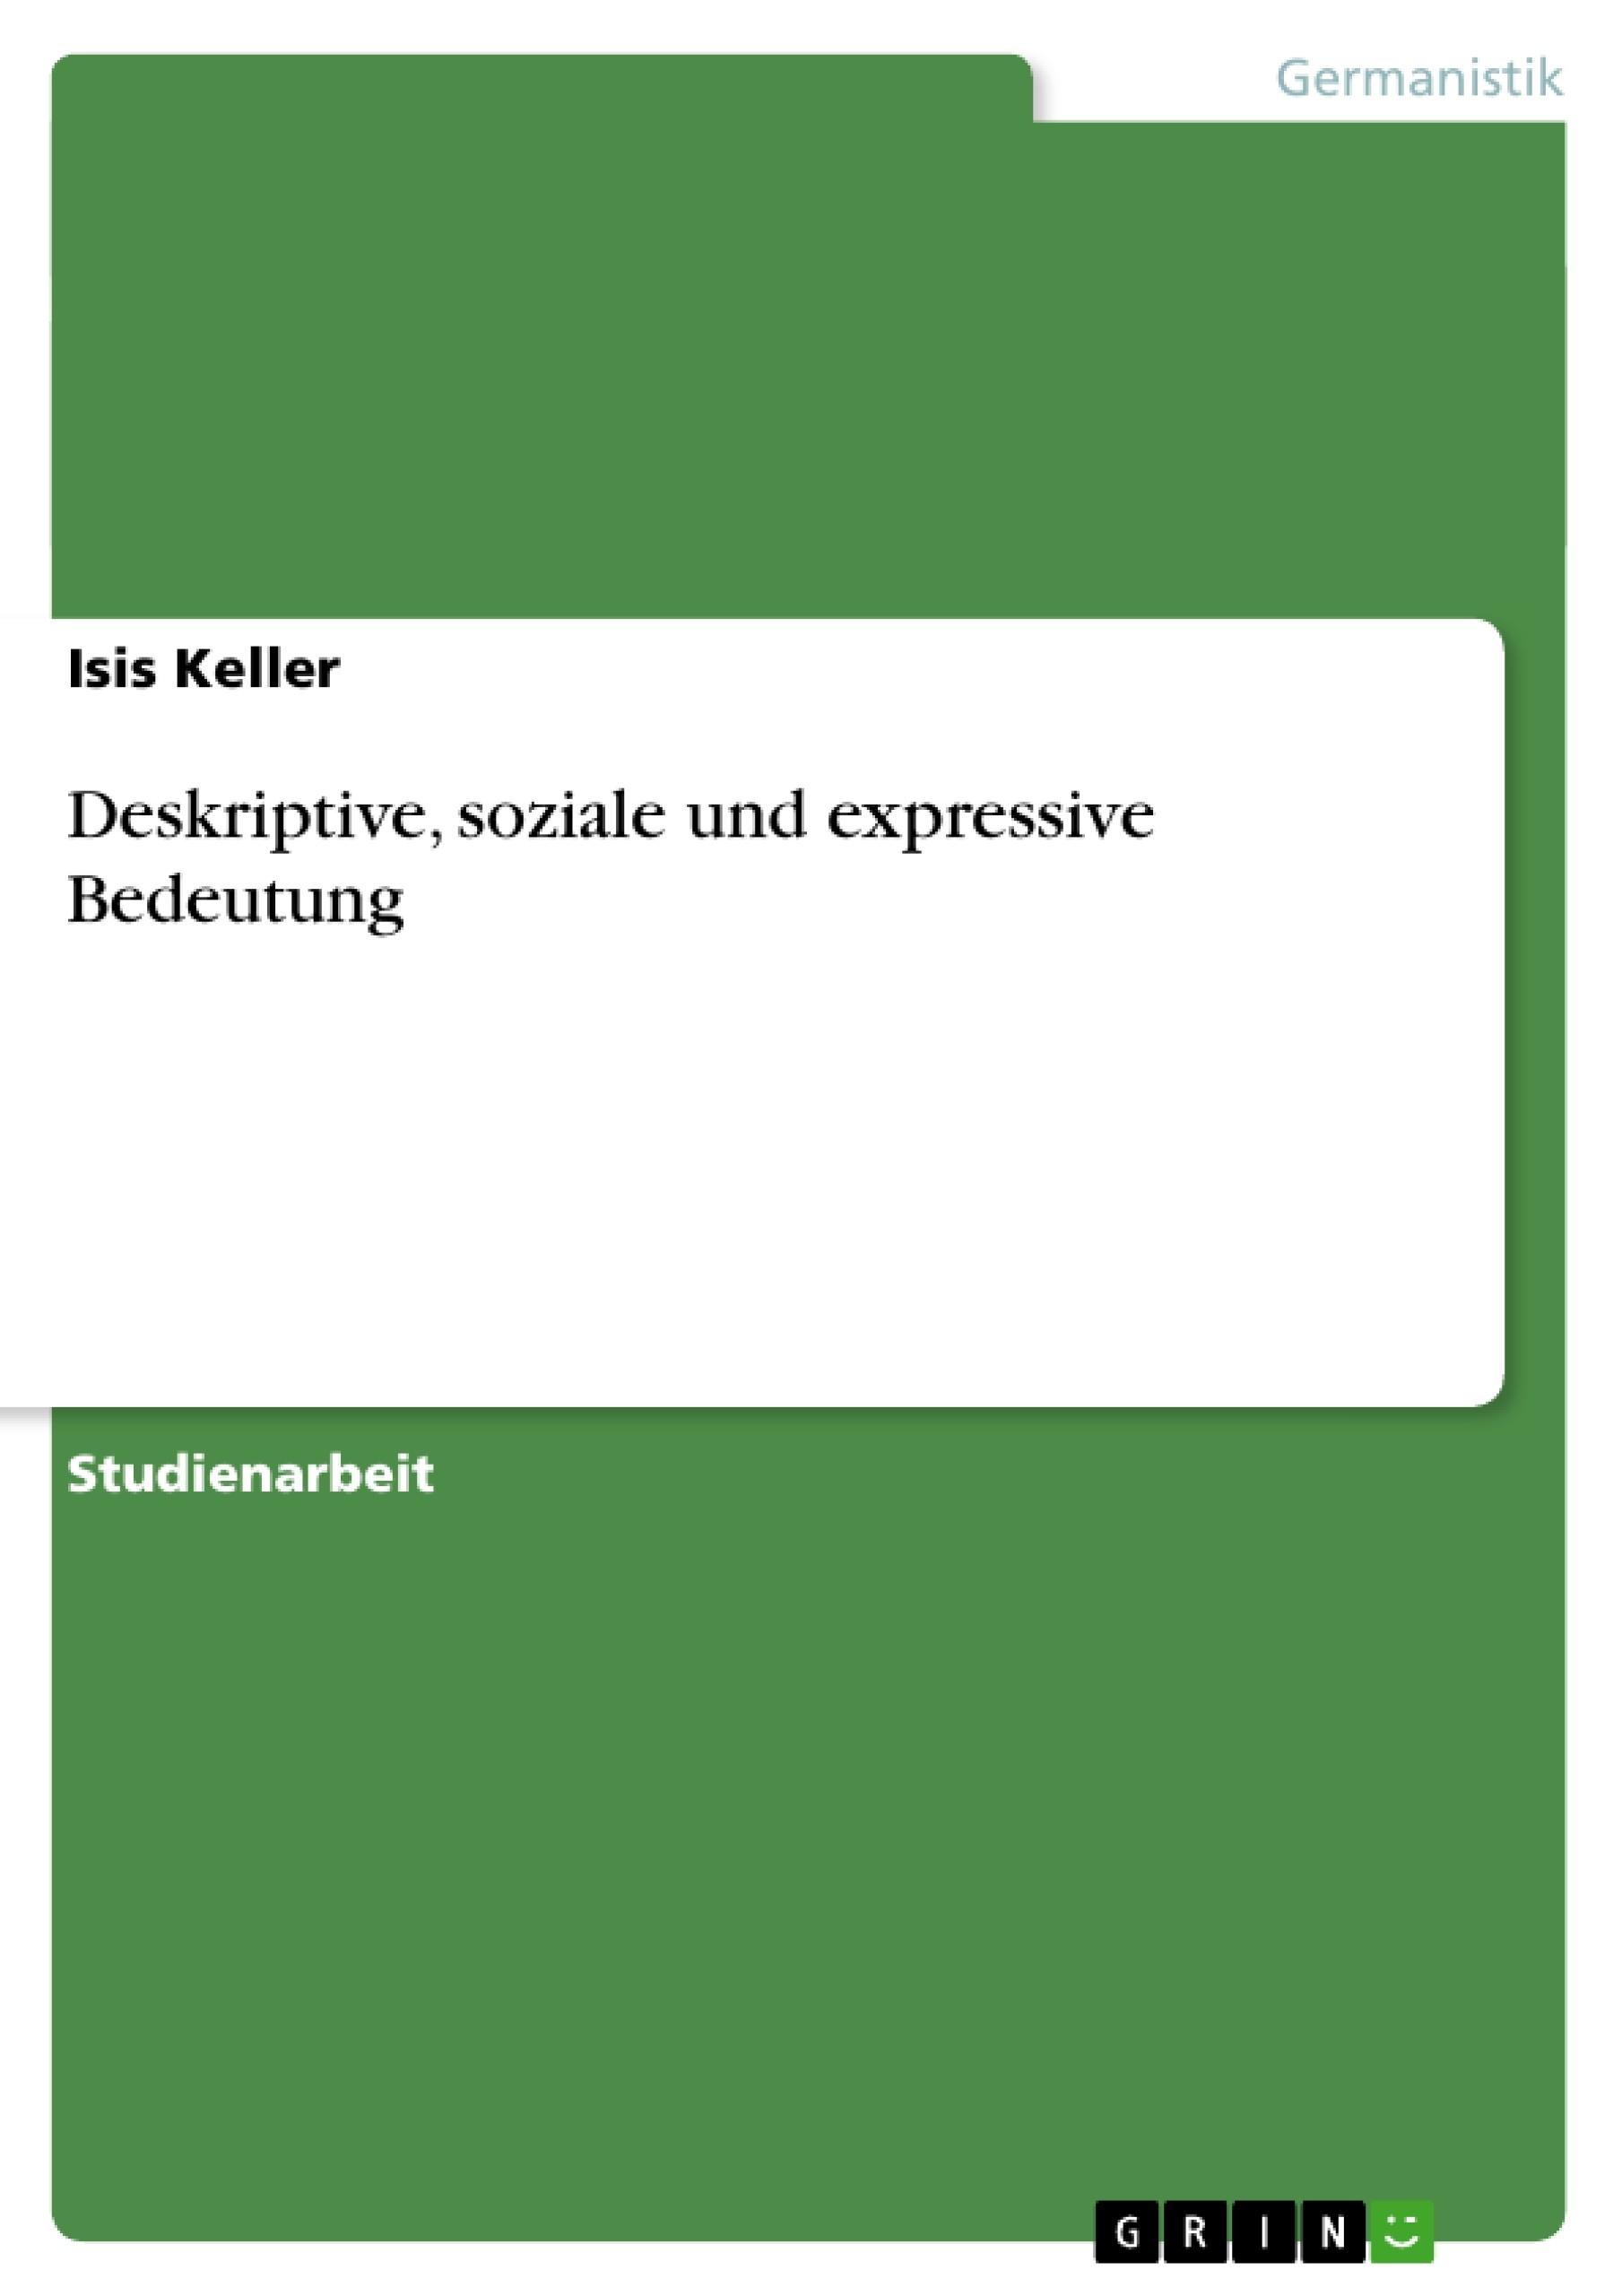 Titel: Deskriptive, soziale und expressive Bedeutung